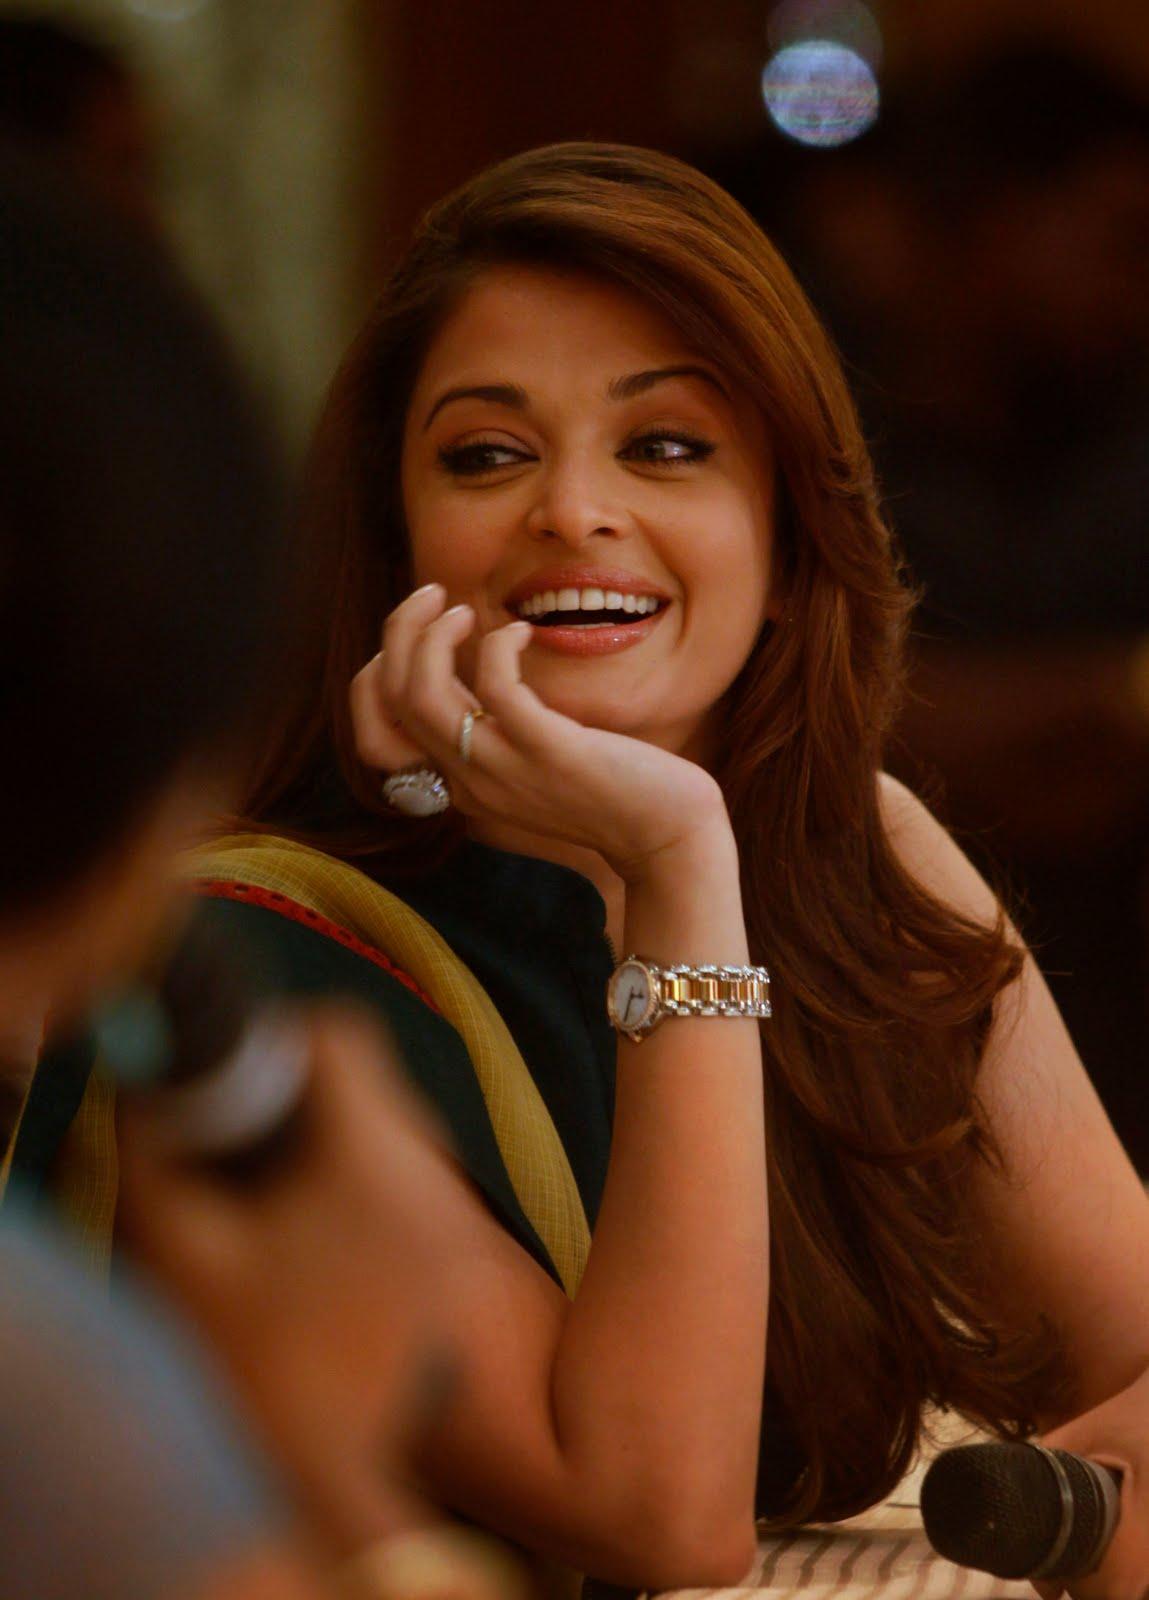 Aishwarya Rai Latest Romance Hairstyles, Long Hairstyle 2013, Hairstyle 2013, New Long Hairstyle 2013, Celebrity Long Romance Hairstyles 2167